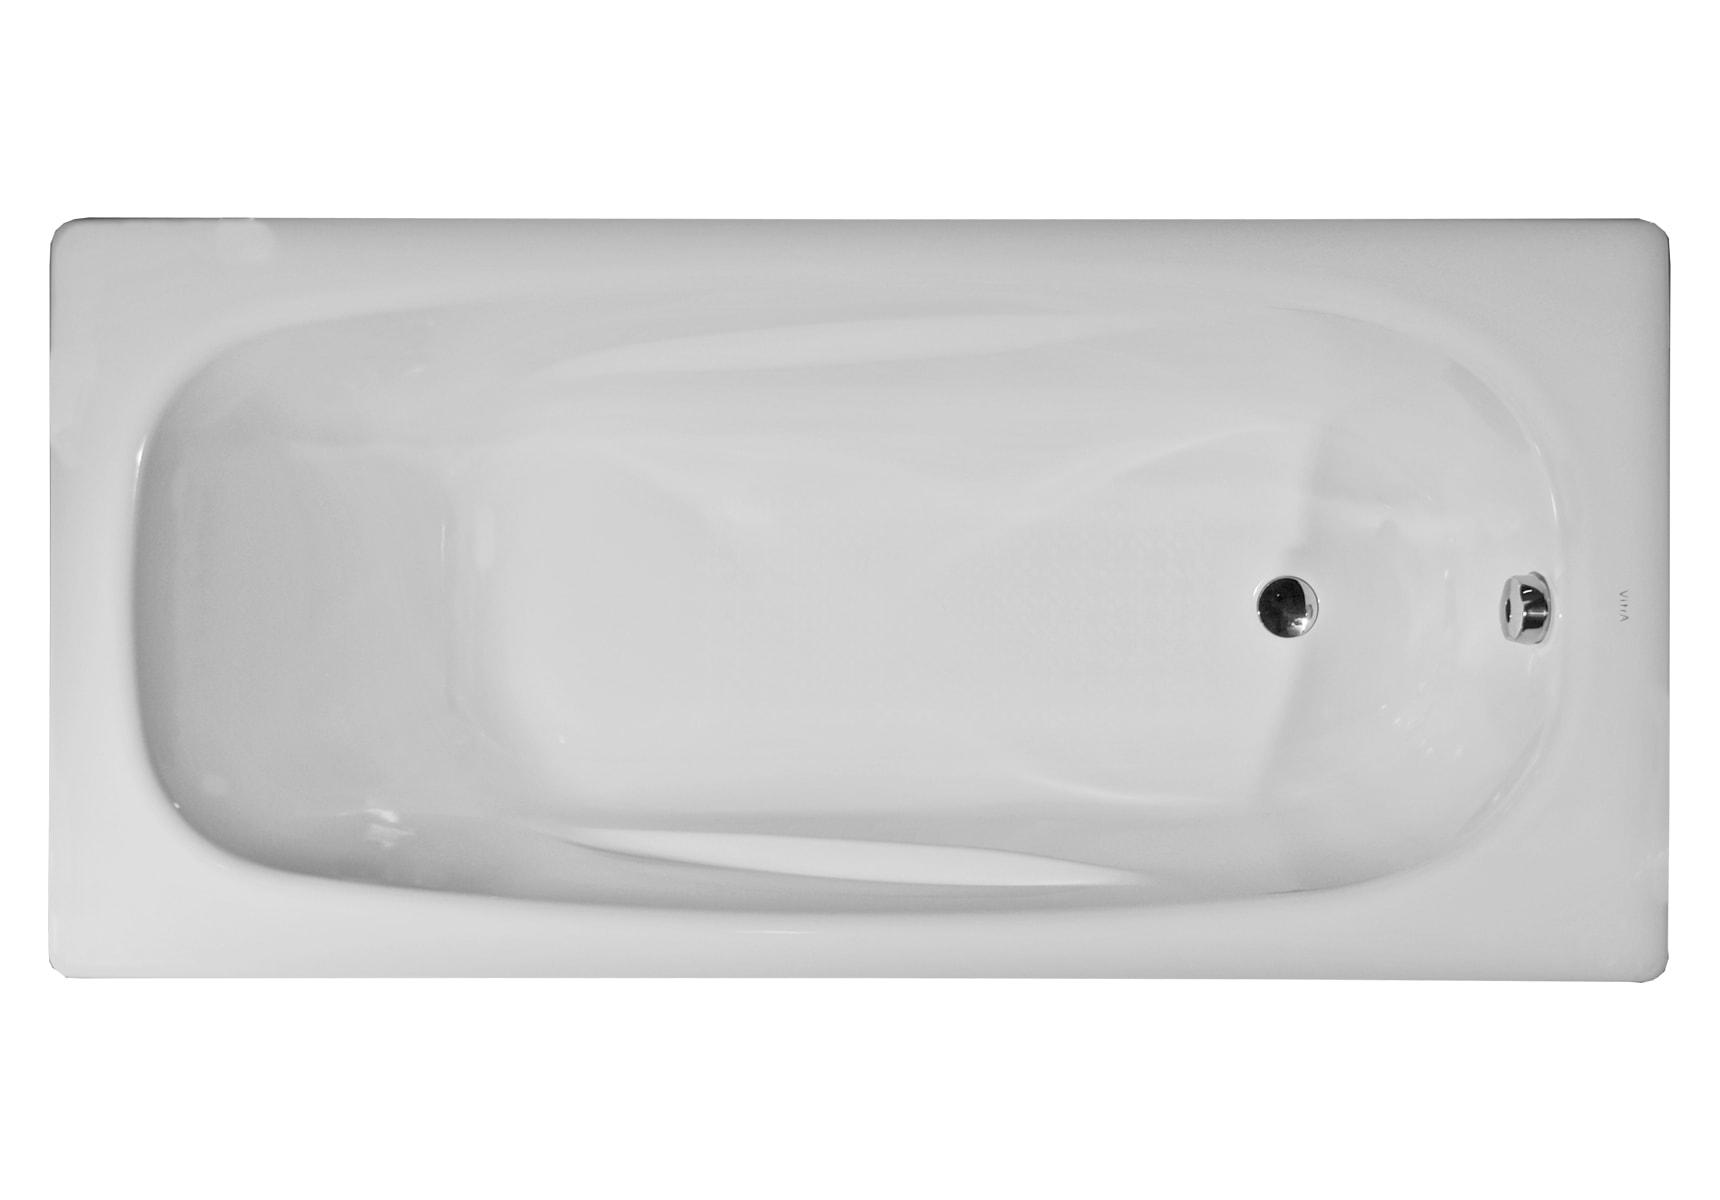 Generic Ergo 160x75cm Steel Bathtub, 3.5mm, Sound Proofing Pad